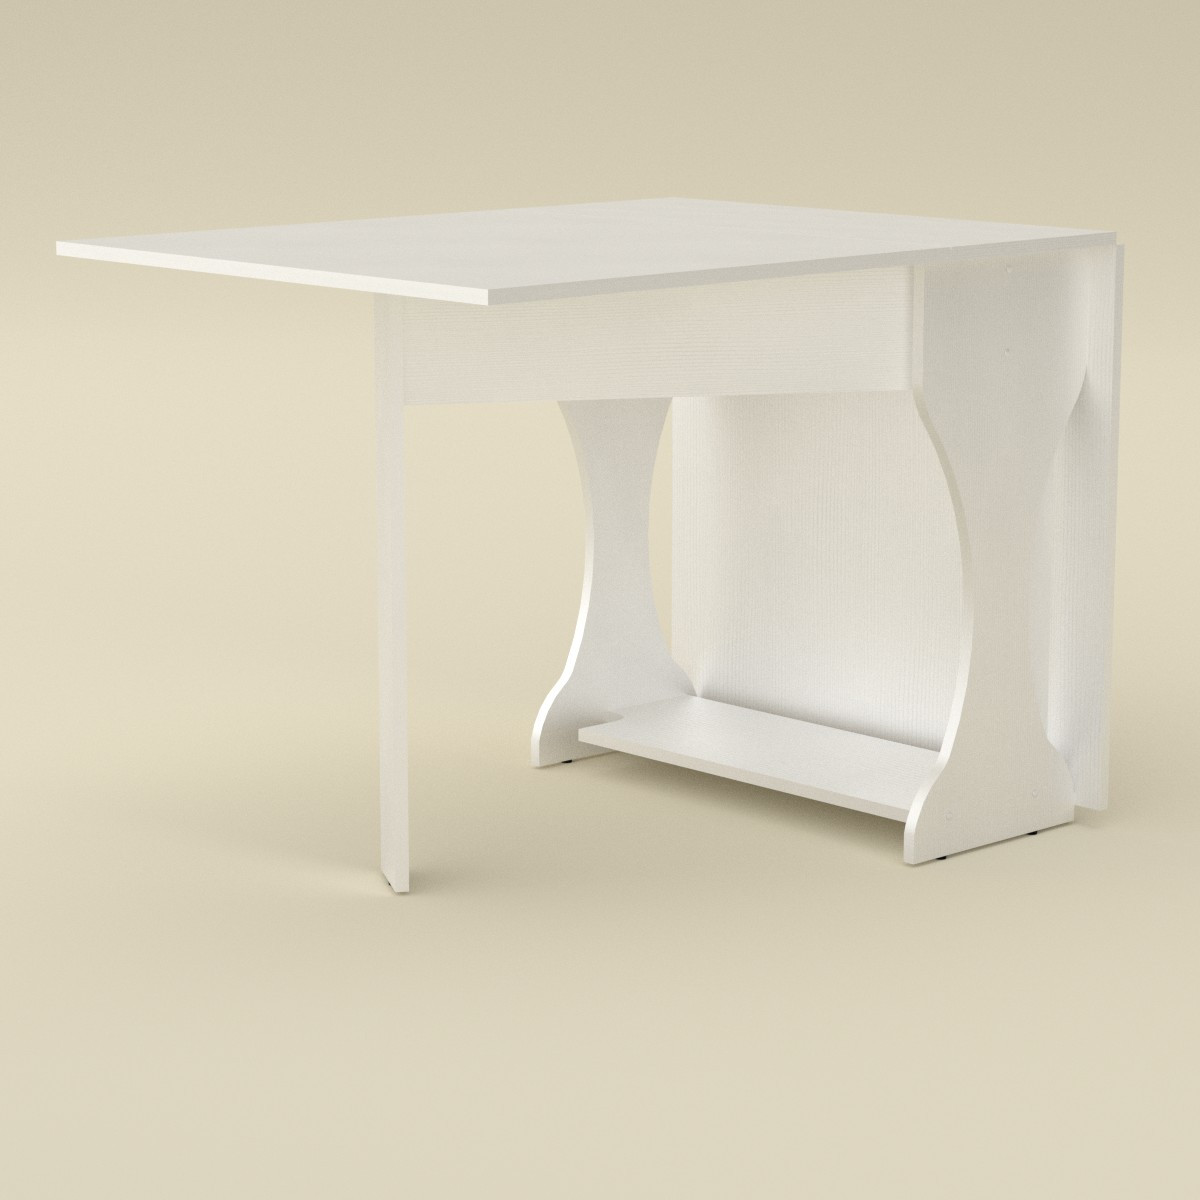 Стол книжка 4 белый Компанит (170х76х74 см)